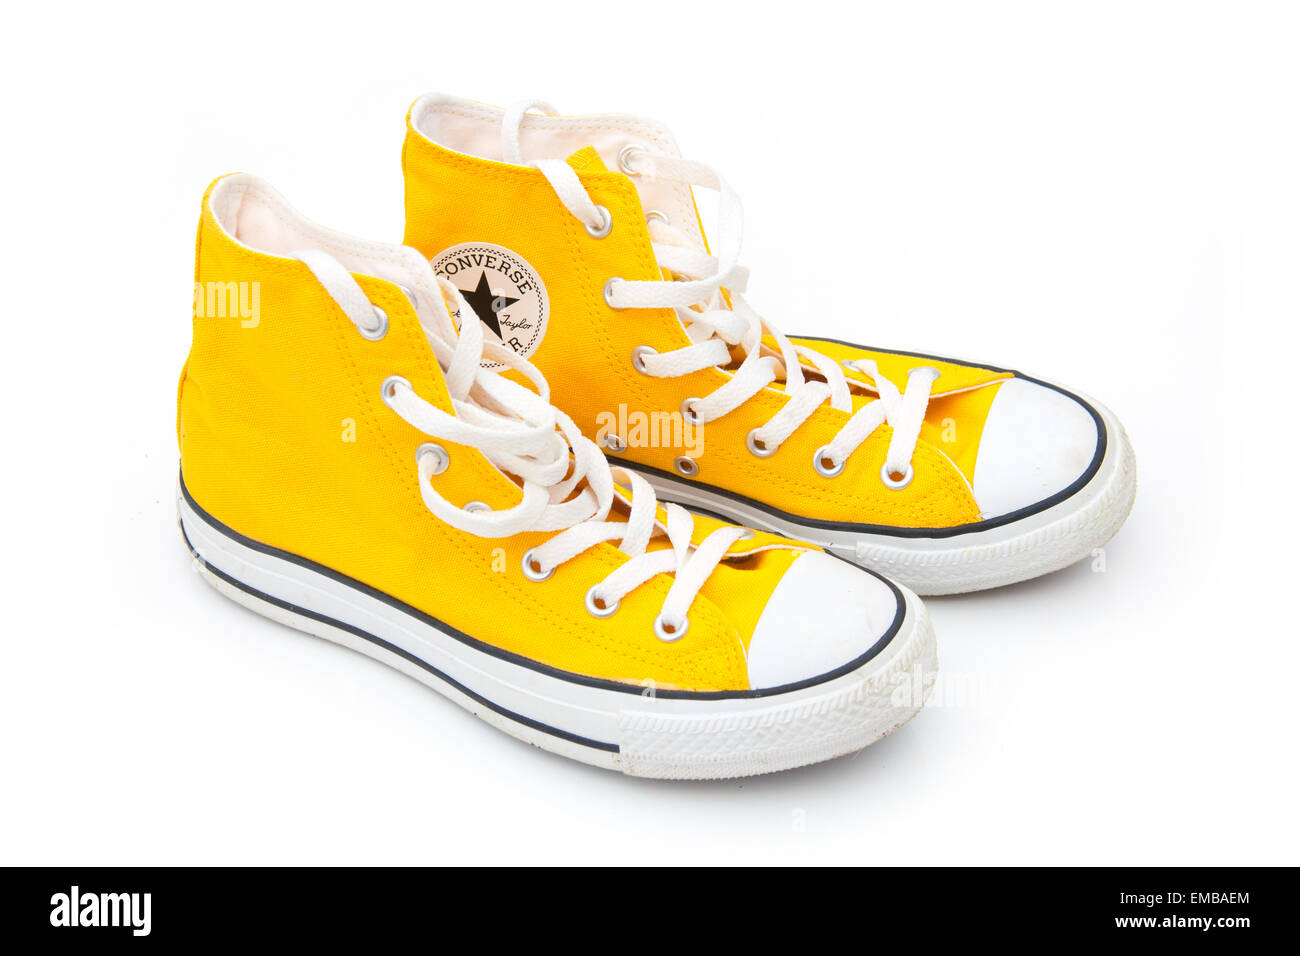 ab91354a Converse botas amarillo aislado sobre un fondo blanco studio. Imagen De  Stock